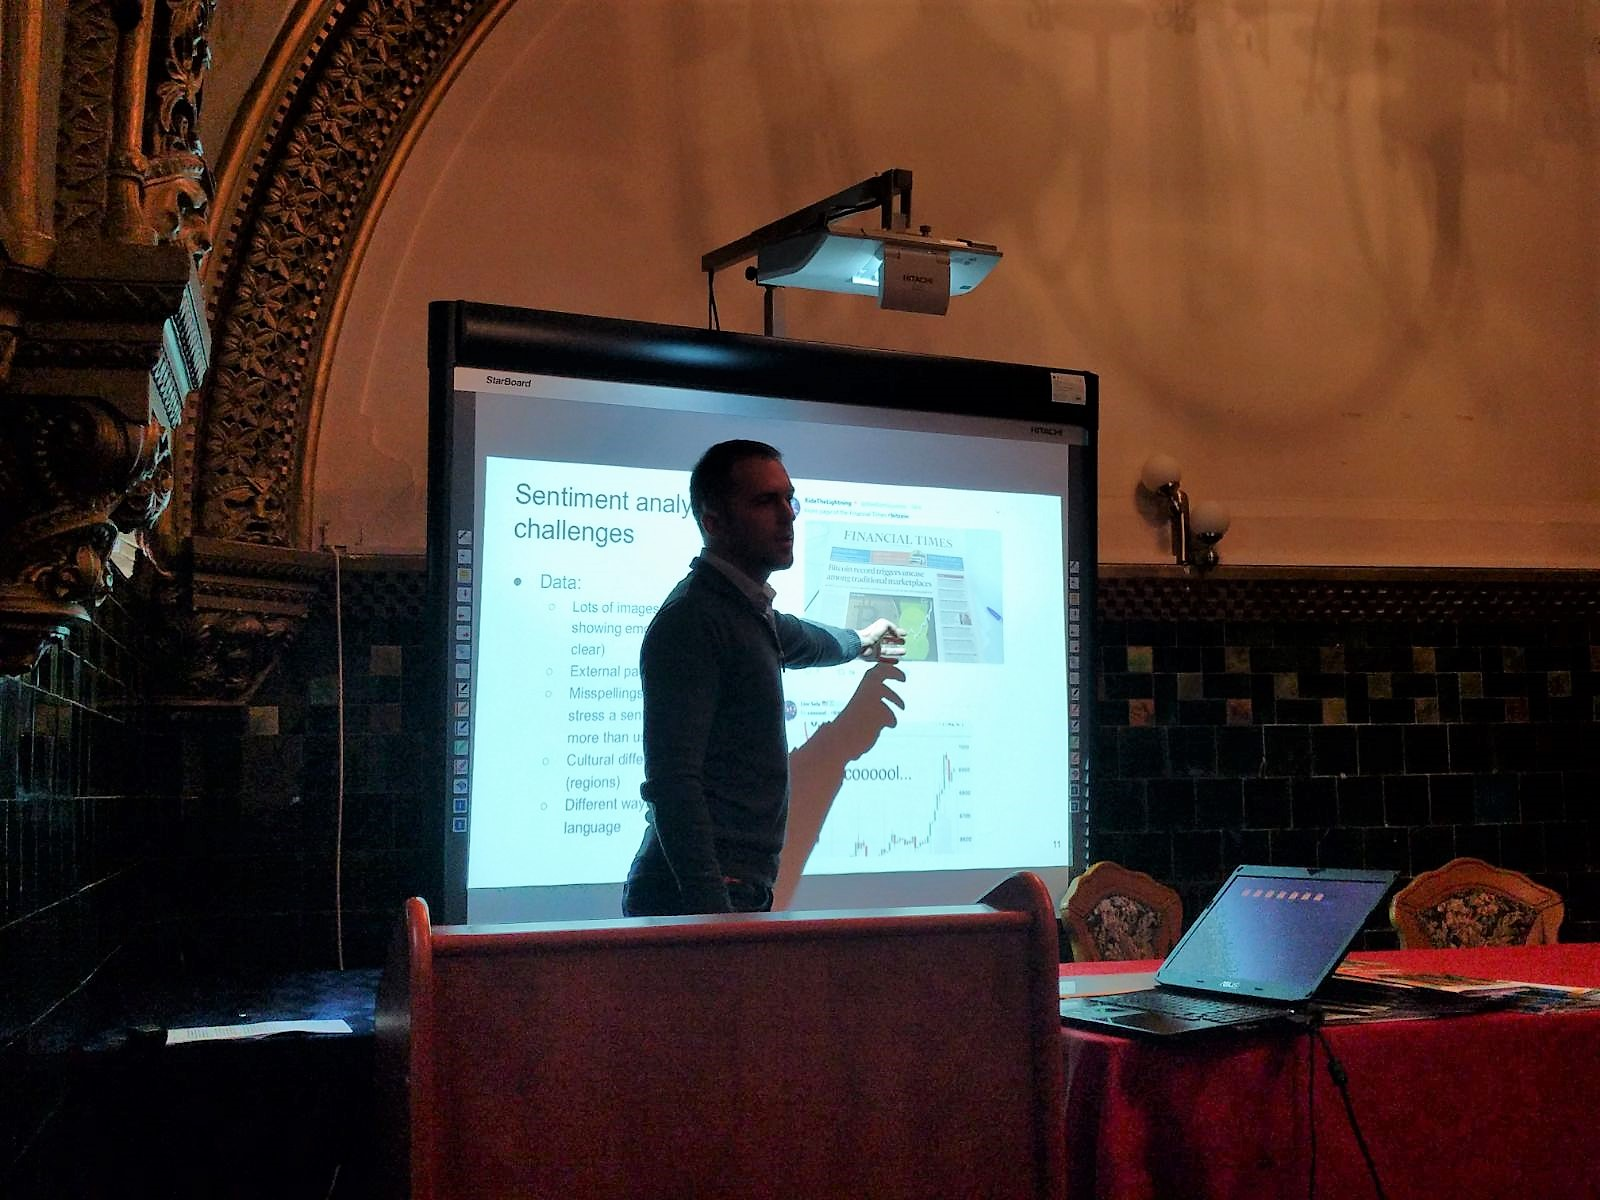 Mircea Moca SynergyCrowds - DigiHubb 2017 data challenge